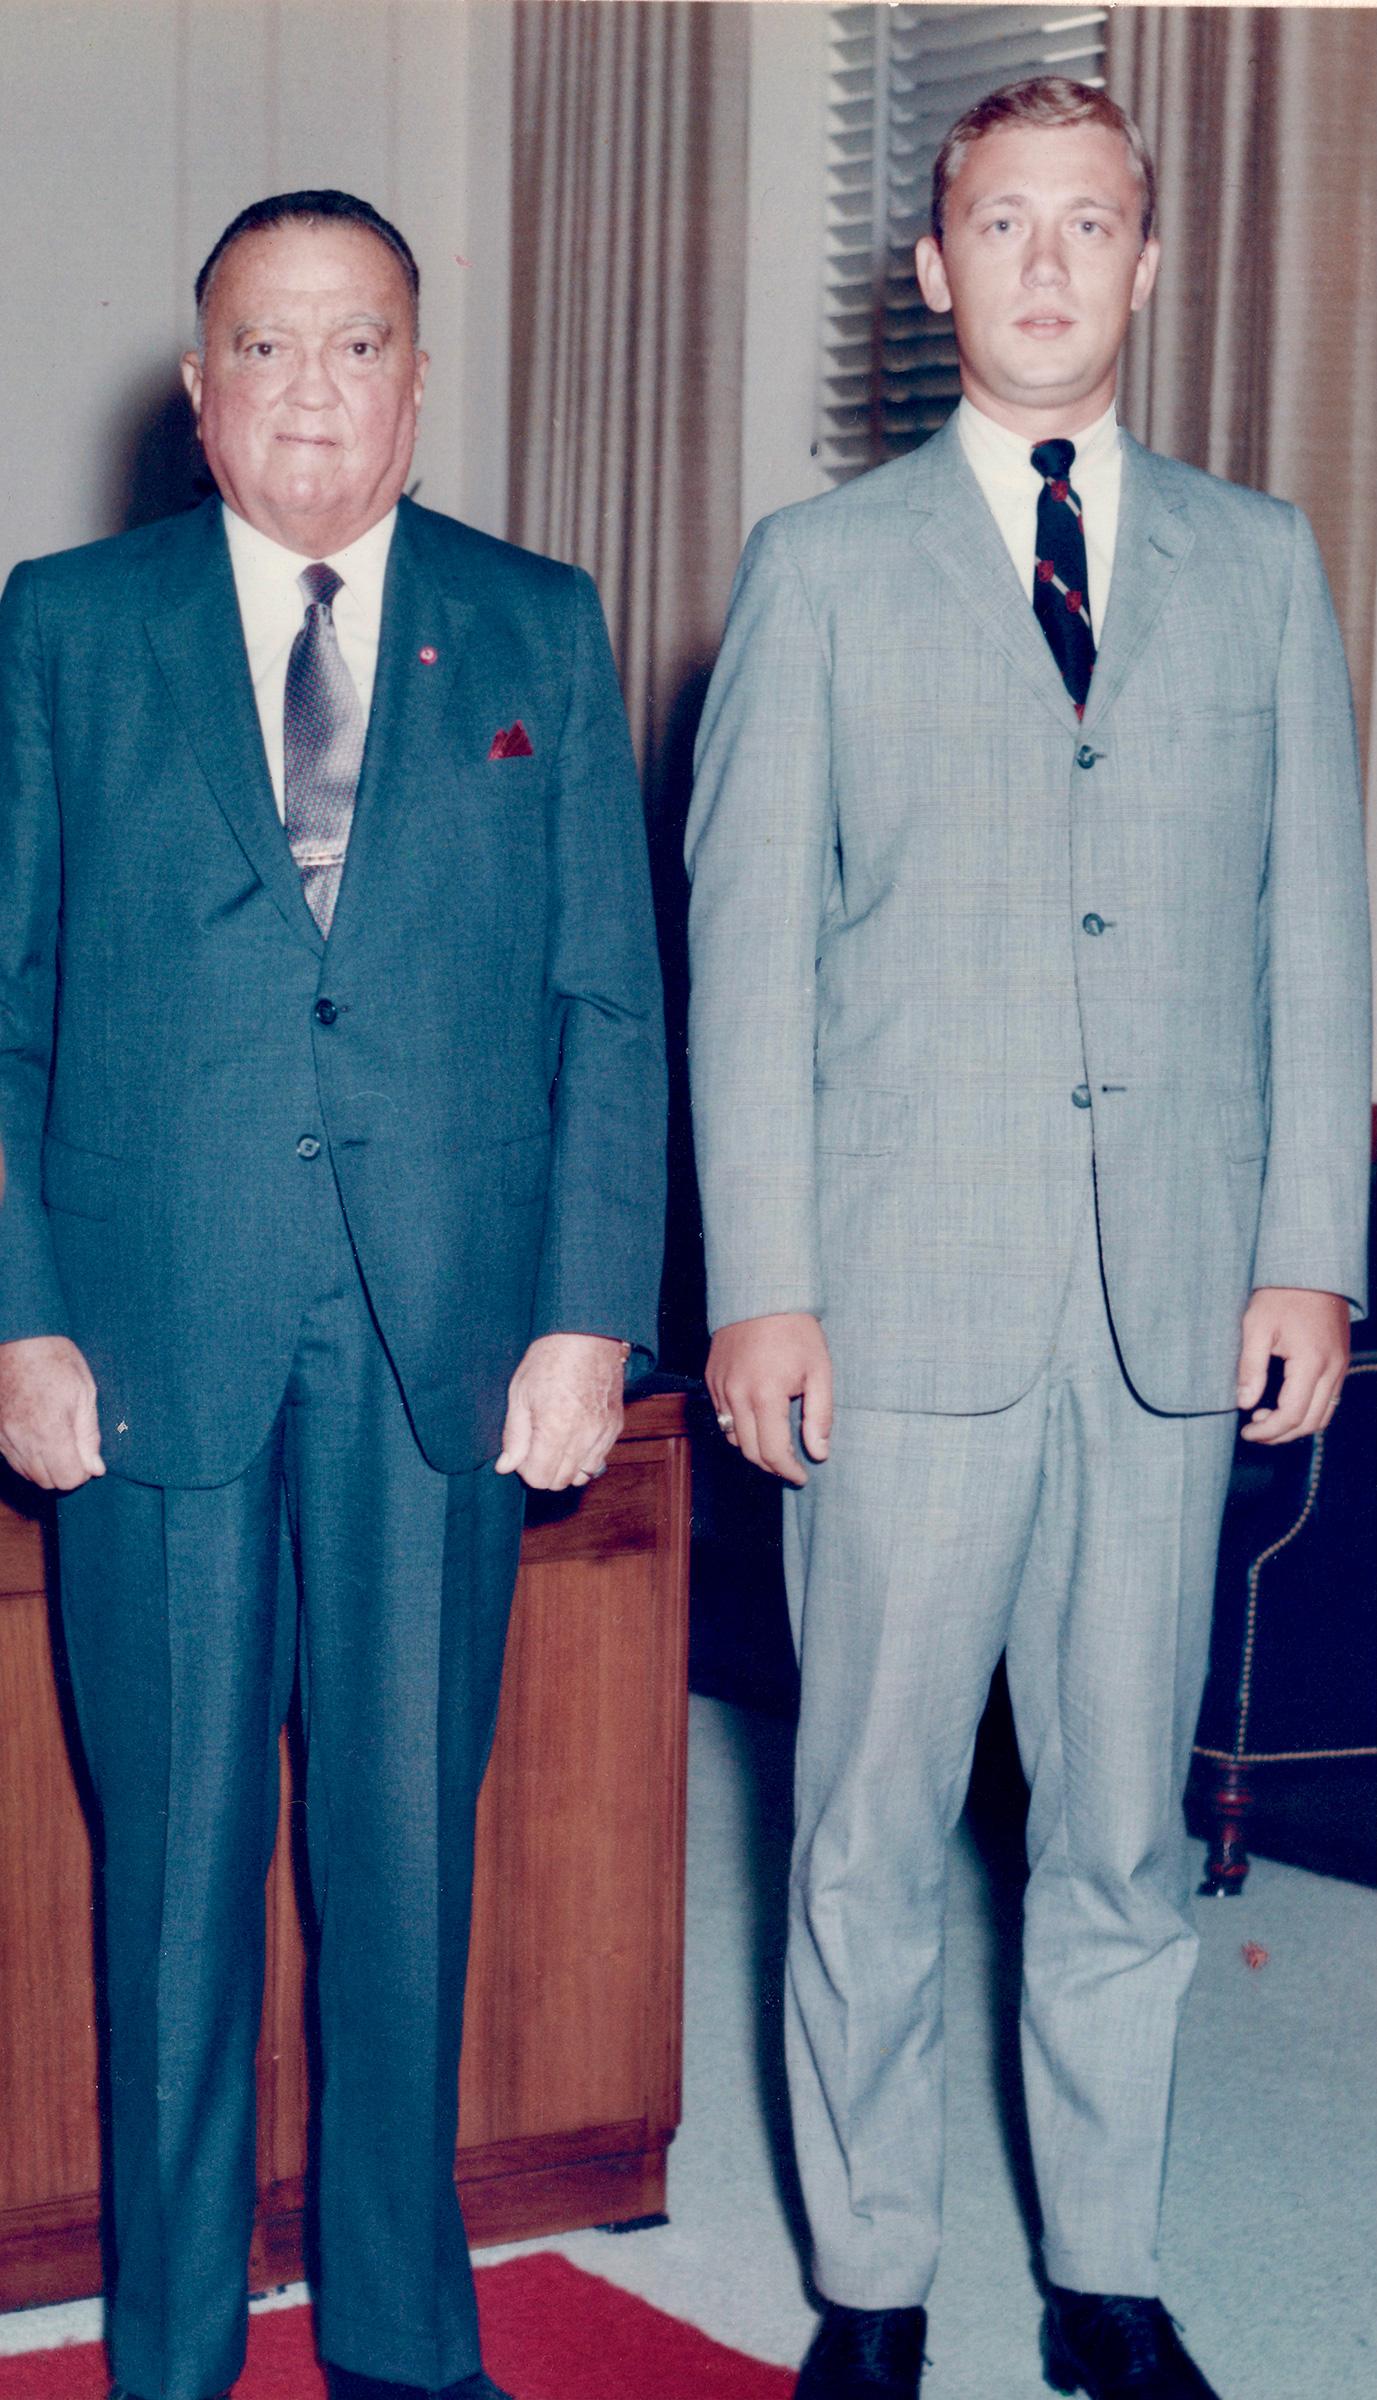 Paul Letersky, right, with FBI Director J. Edgar Hoover in 1968